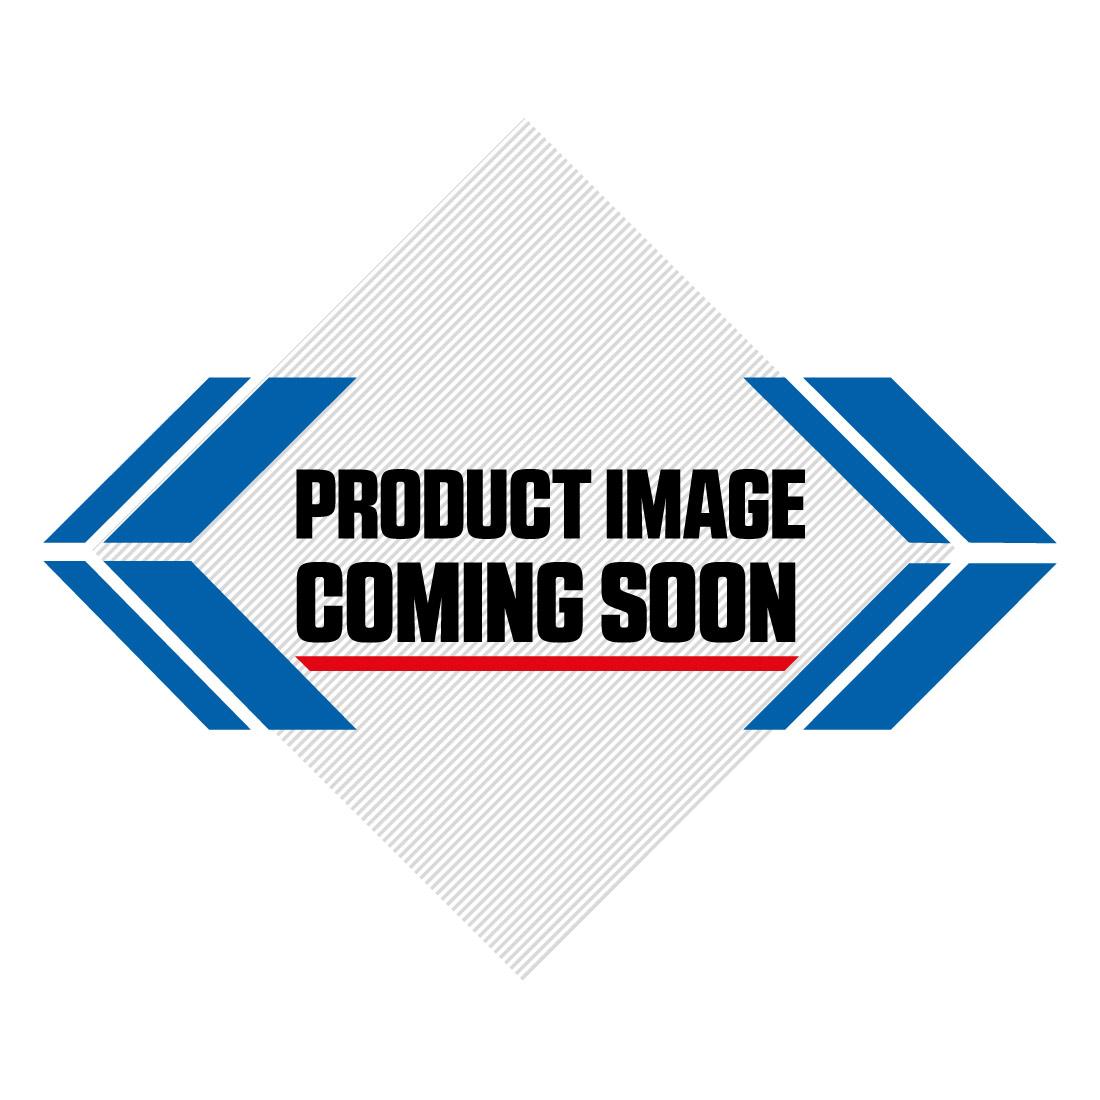 UFO Division Acqua Marina Motocross Kit Combo Image-2>